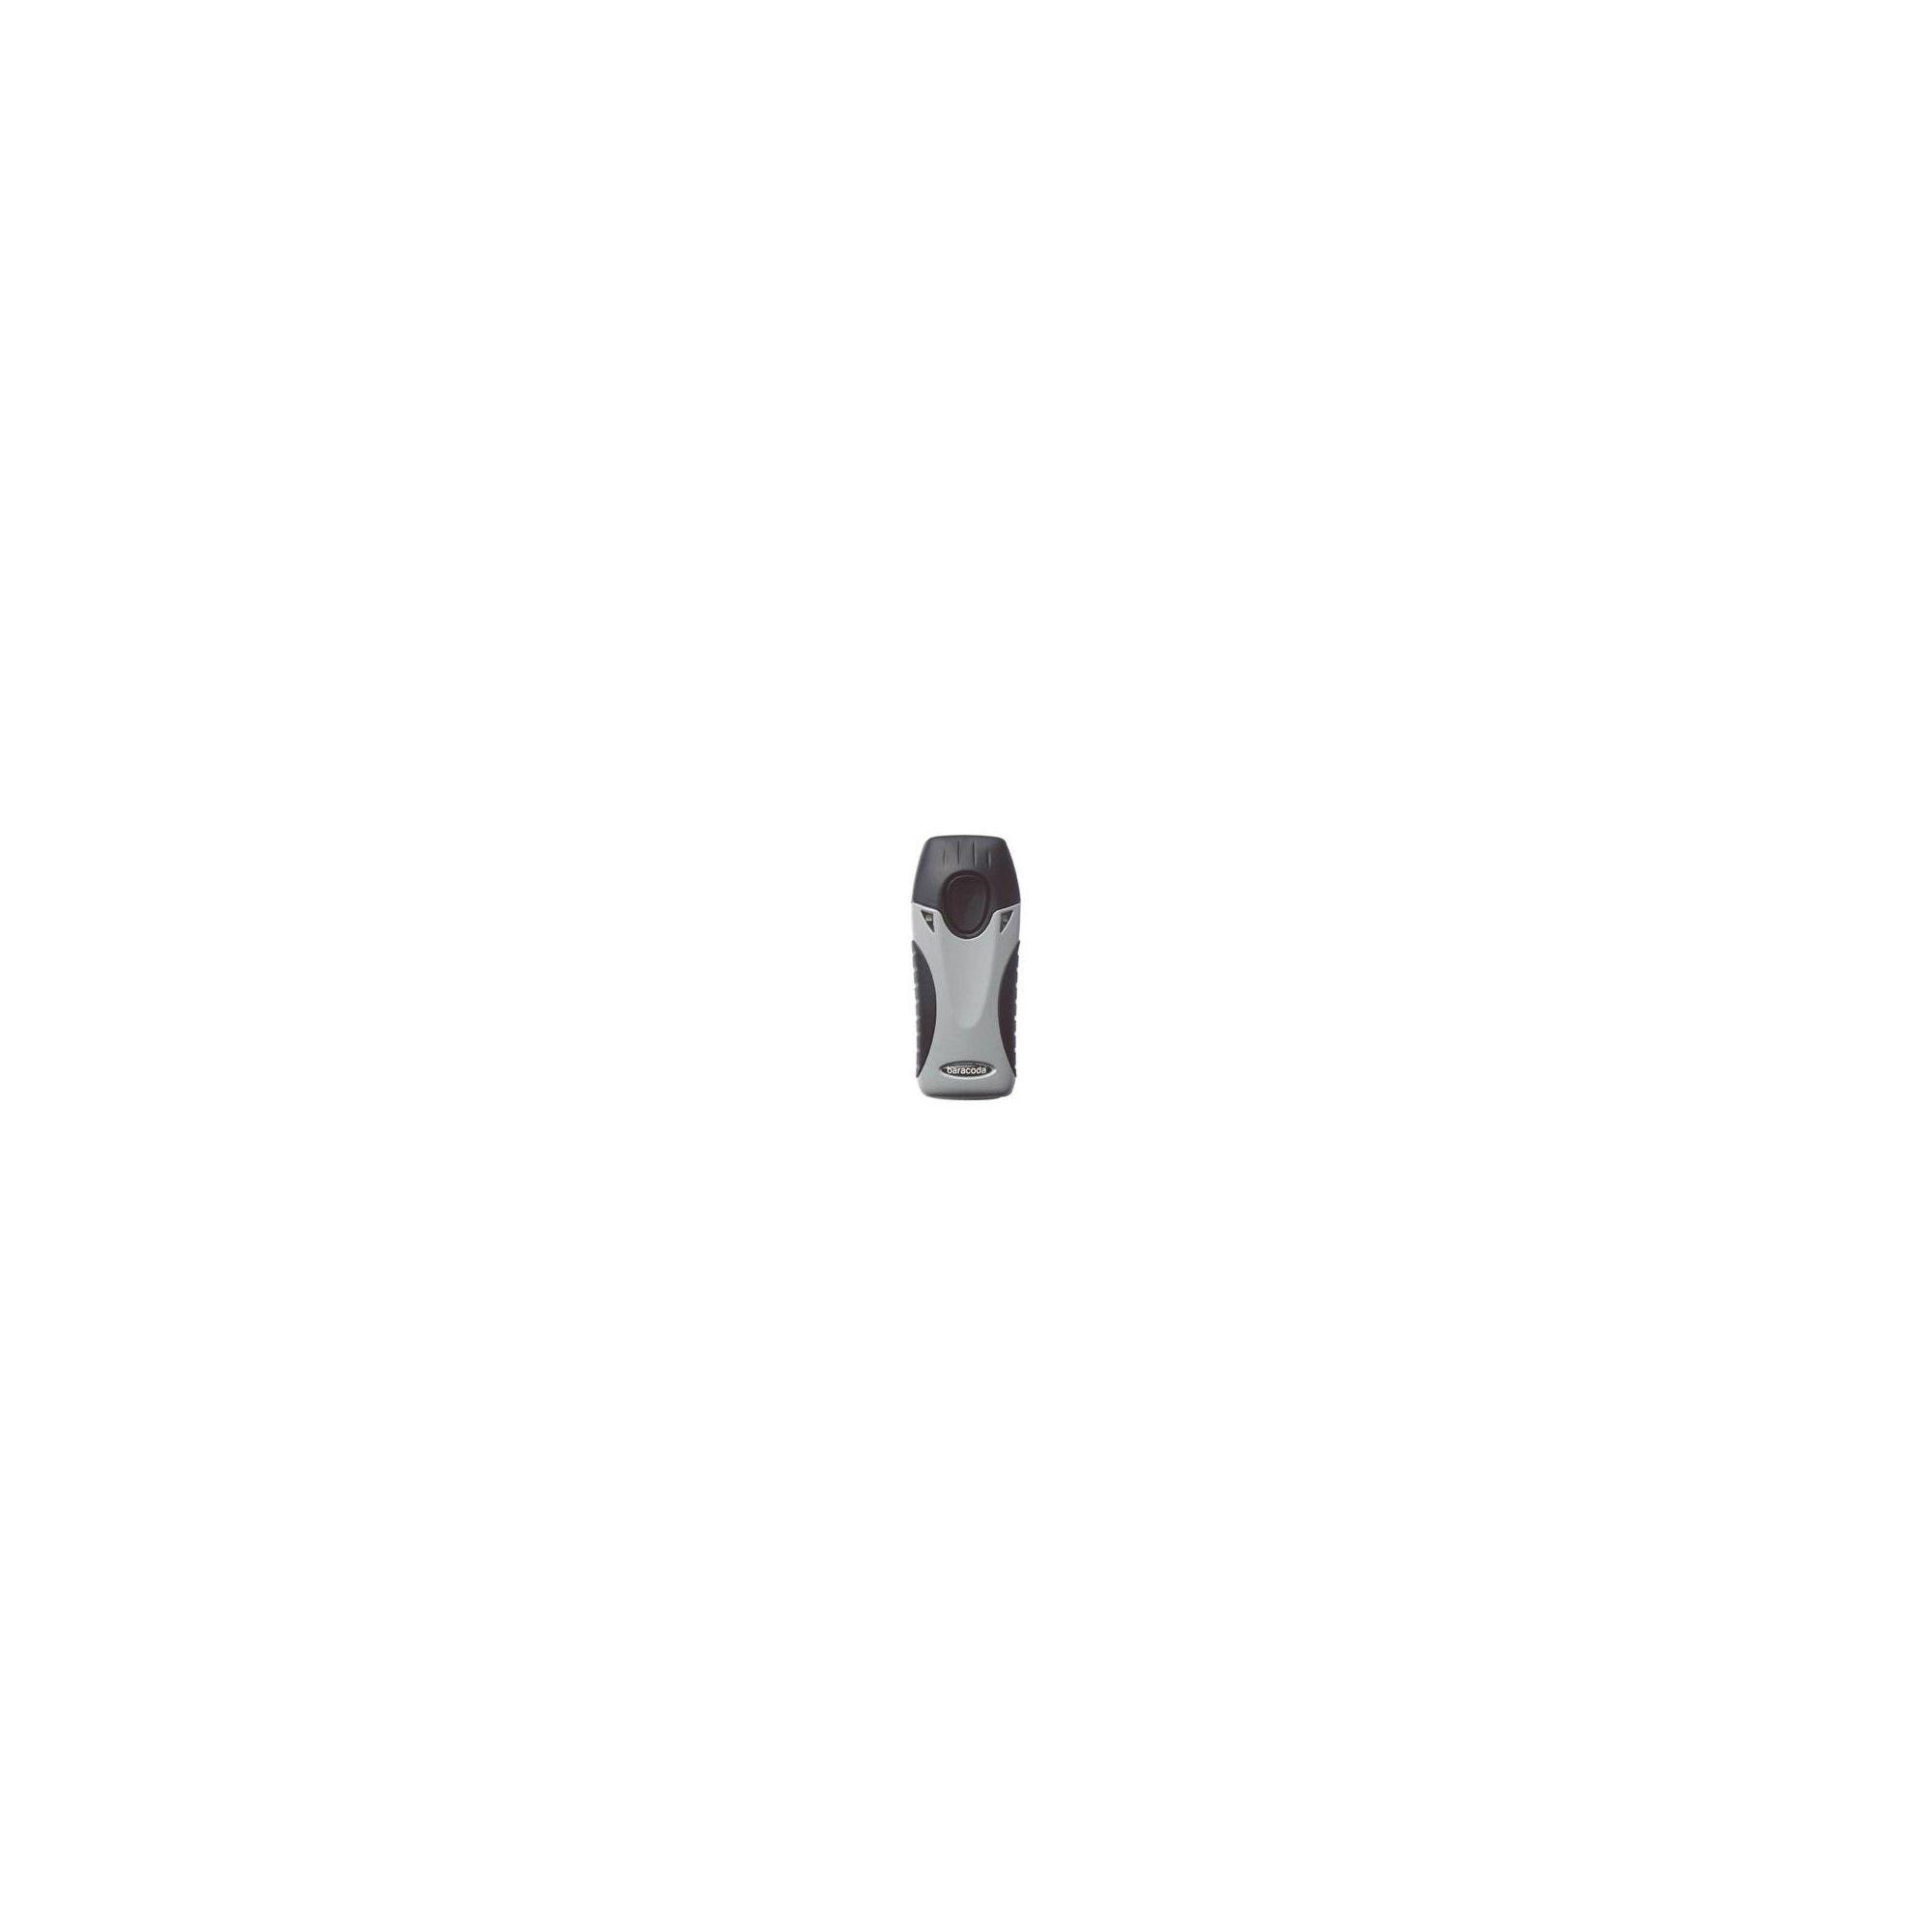 Baracoda RoadRunner Laser 1D Evolution Bluetooth Scanner at Tesco Direct